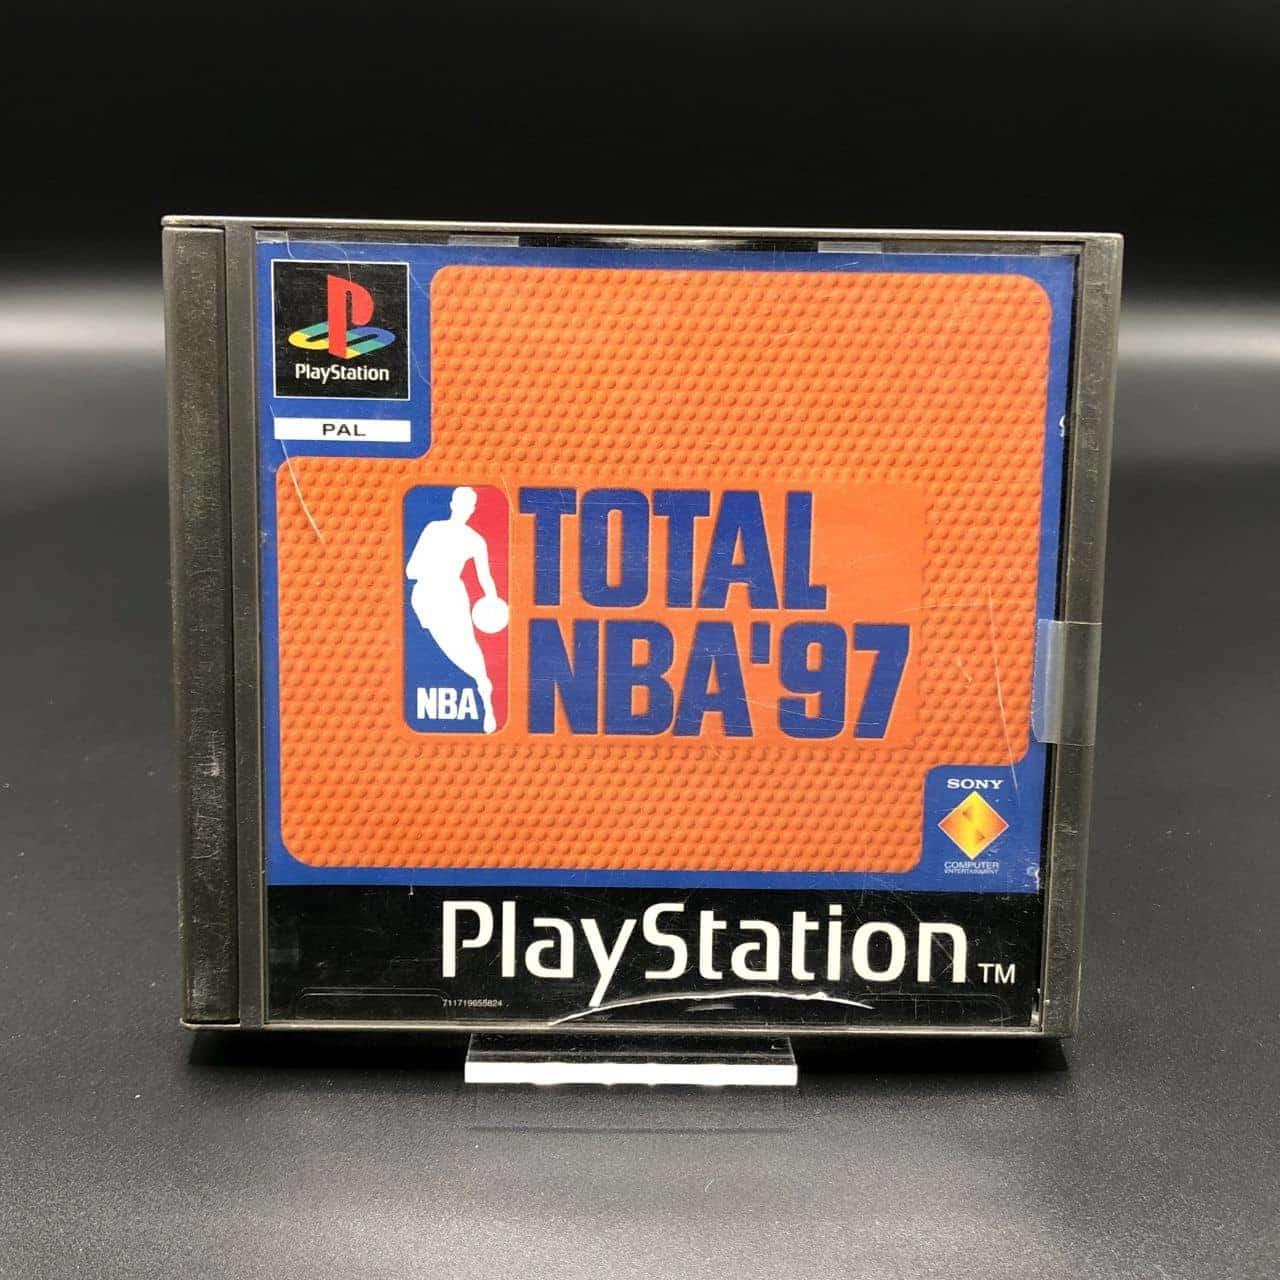 PS1 Total NBA 97 (Komplett) (Sehr gut) Sony PlayStation 1